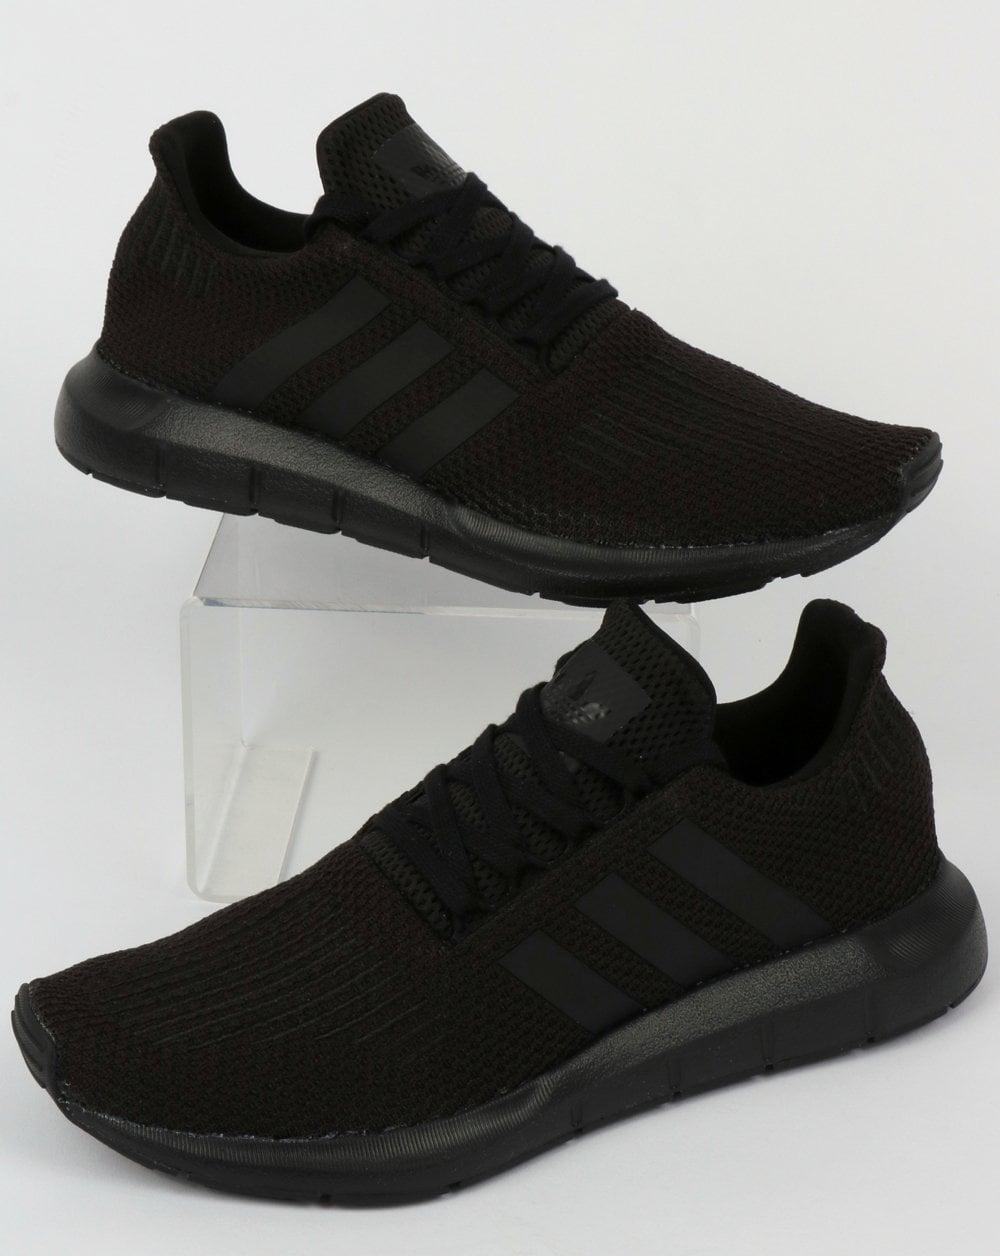 35438bdeac0c adidas Trainers Adidas Swift Run Trainers Triple Black